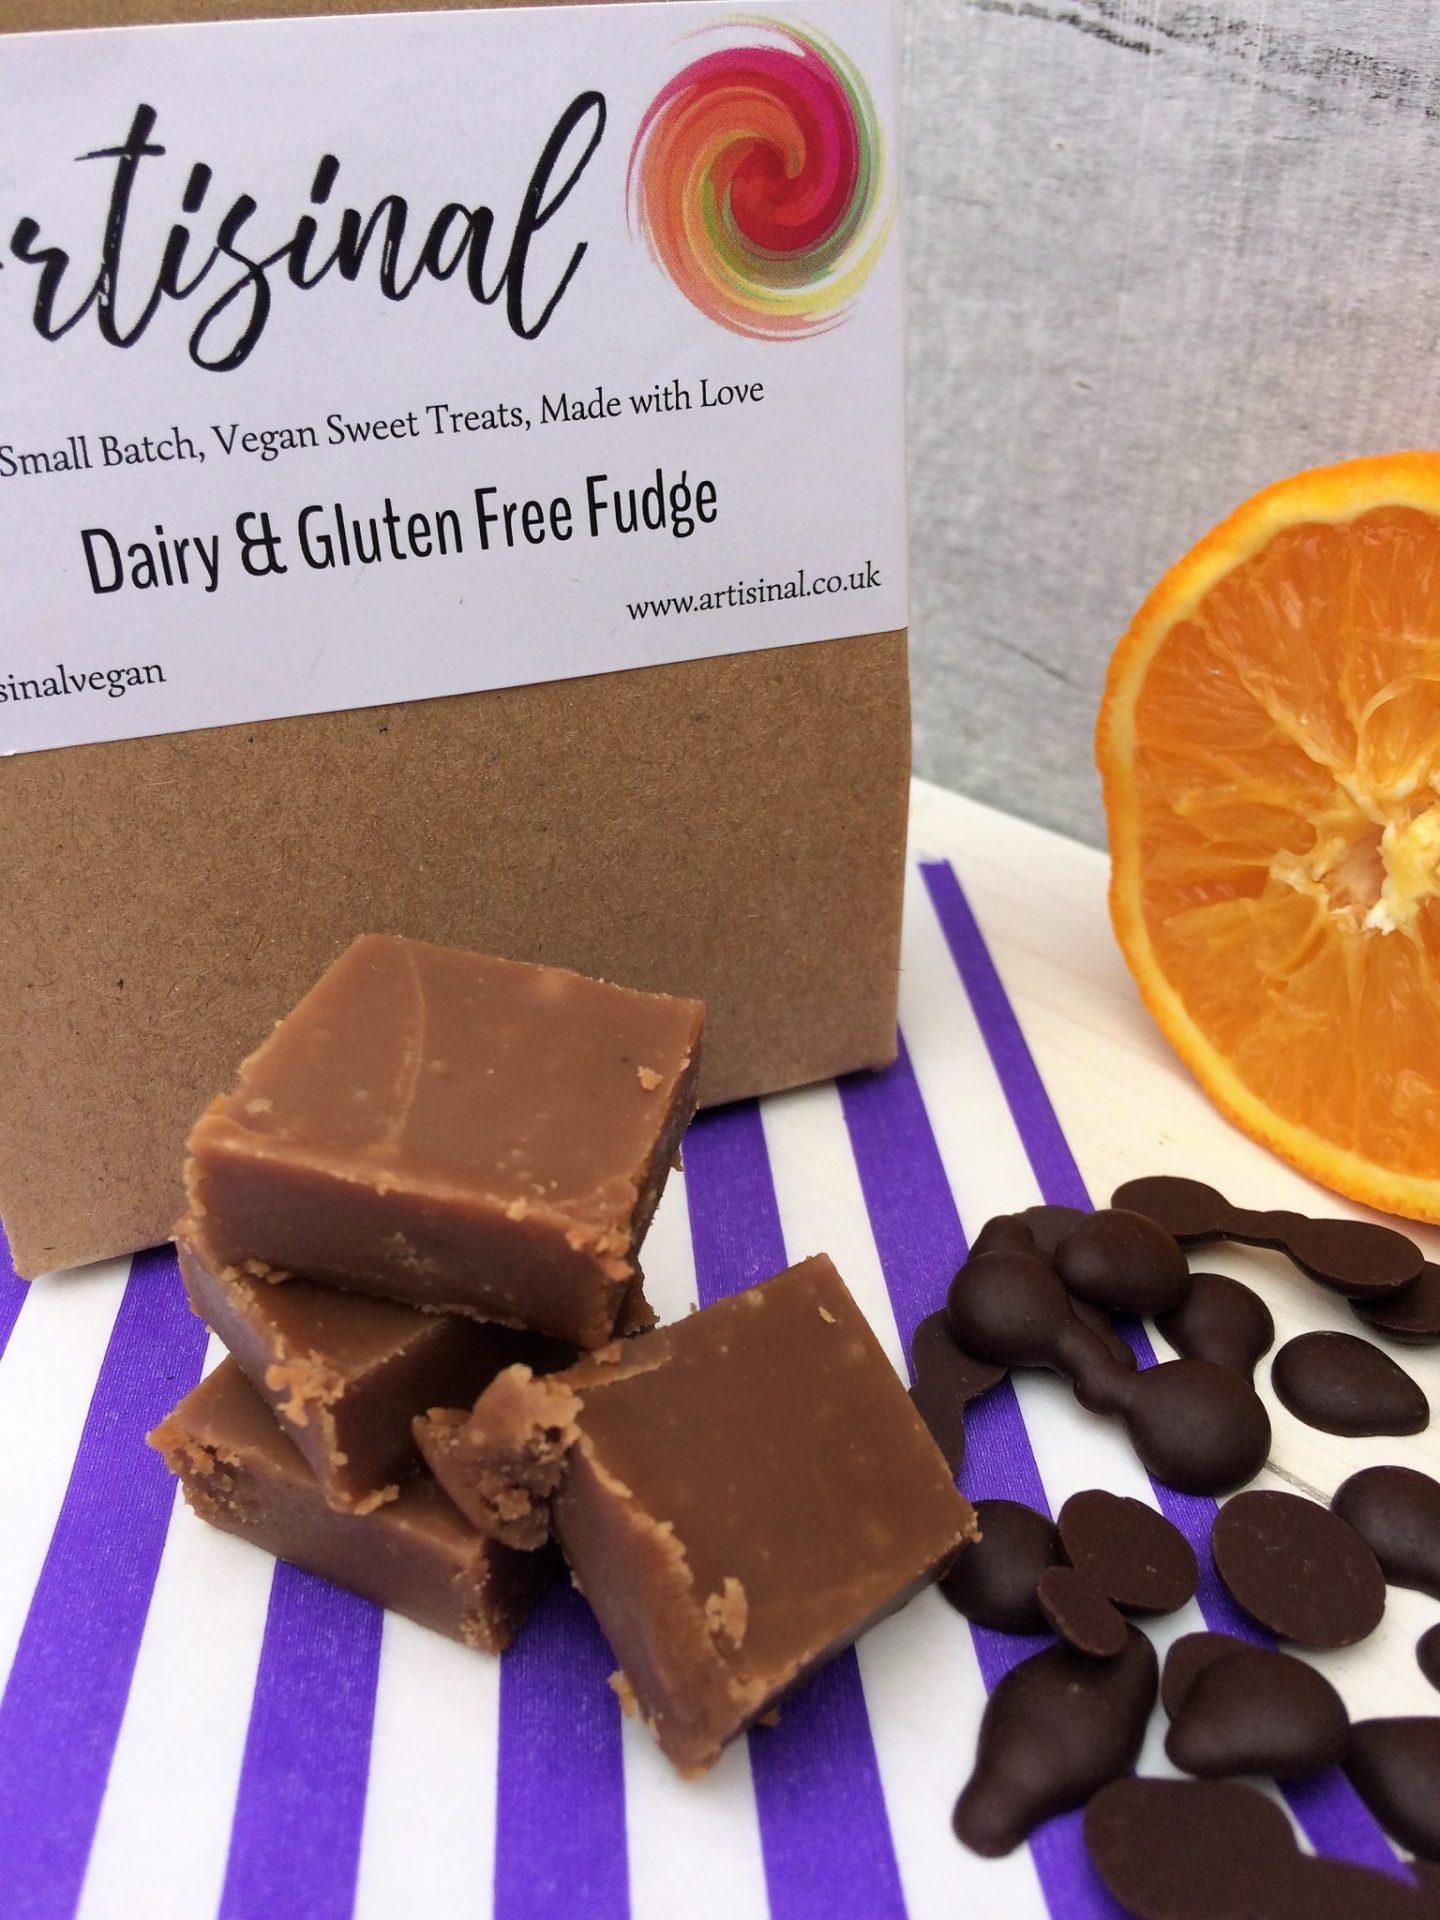 Vegan Fudge Chocolate Orange Dairy And Gluten Free No Plastic